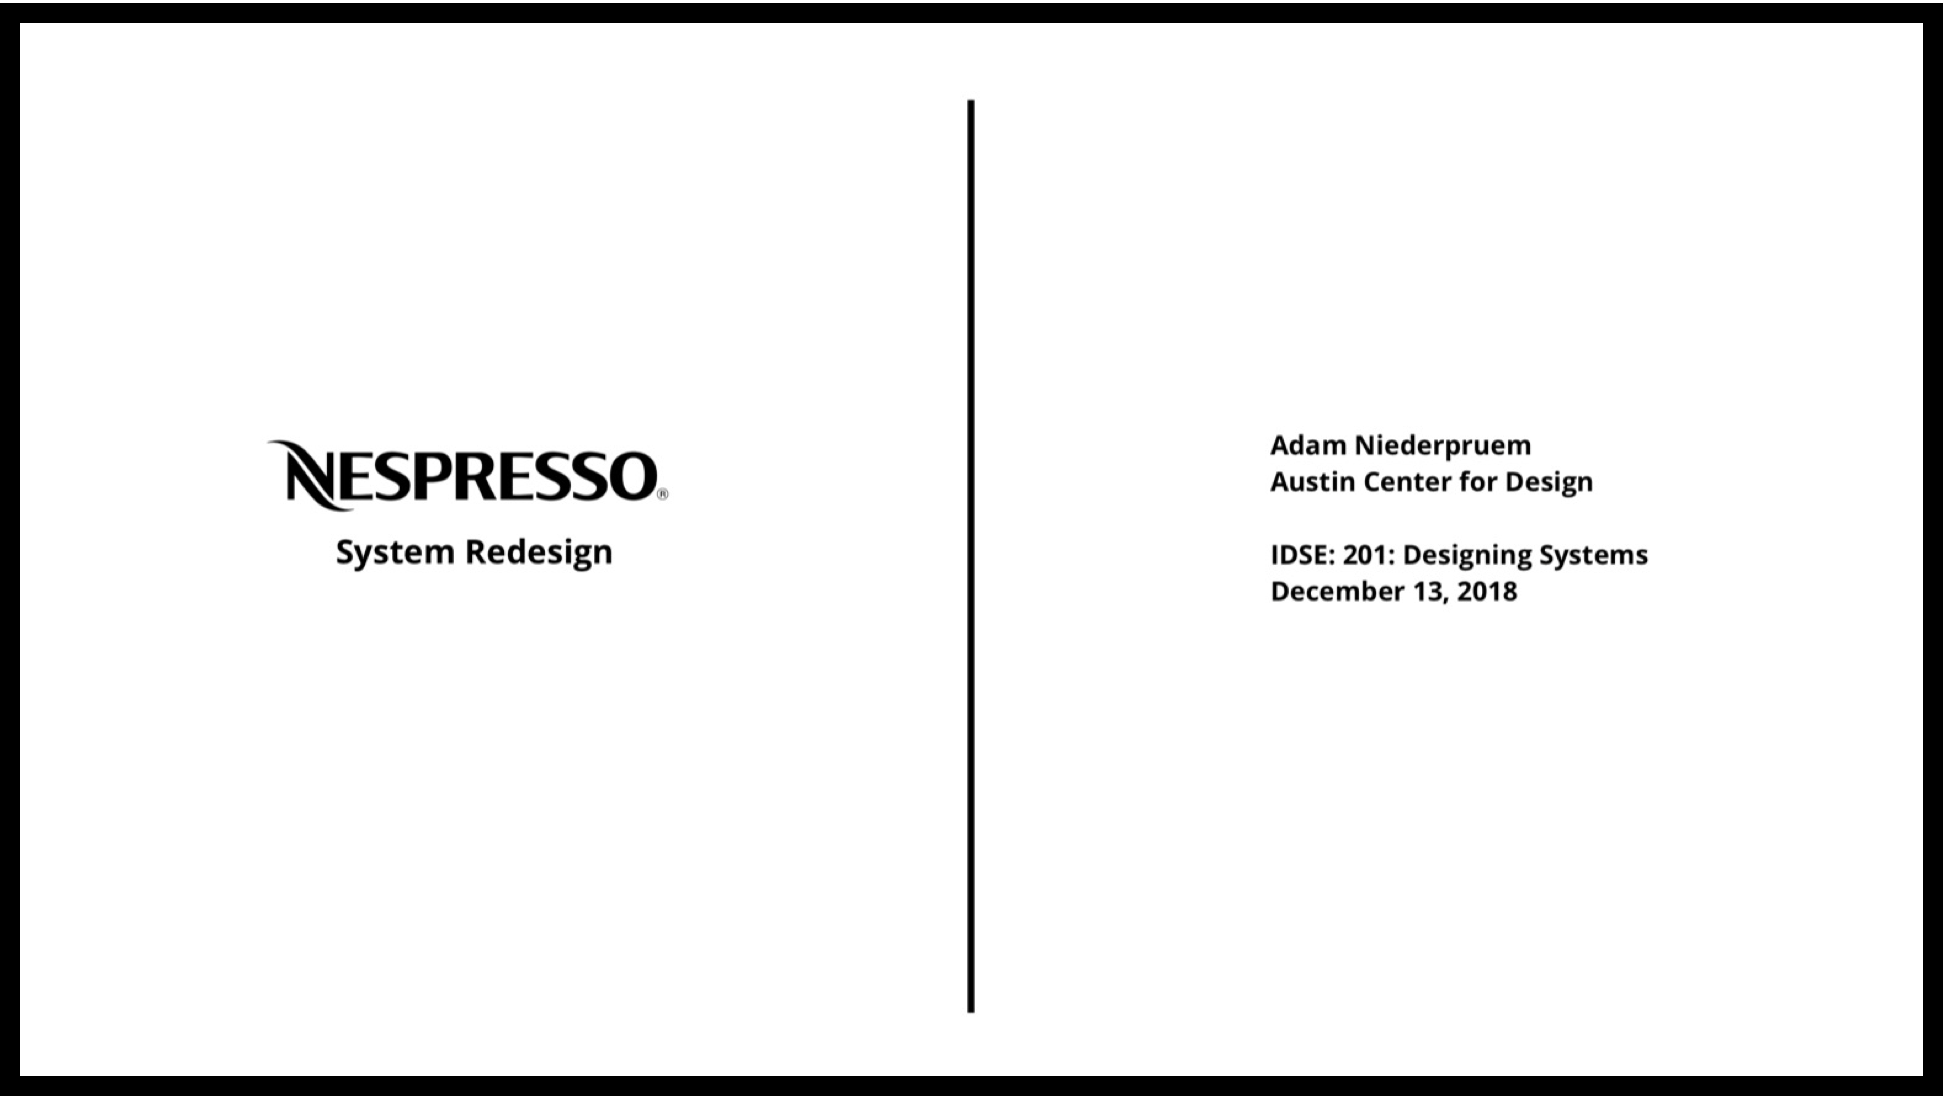 Nespresso Cover.png